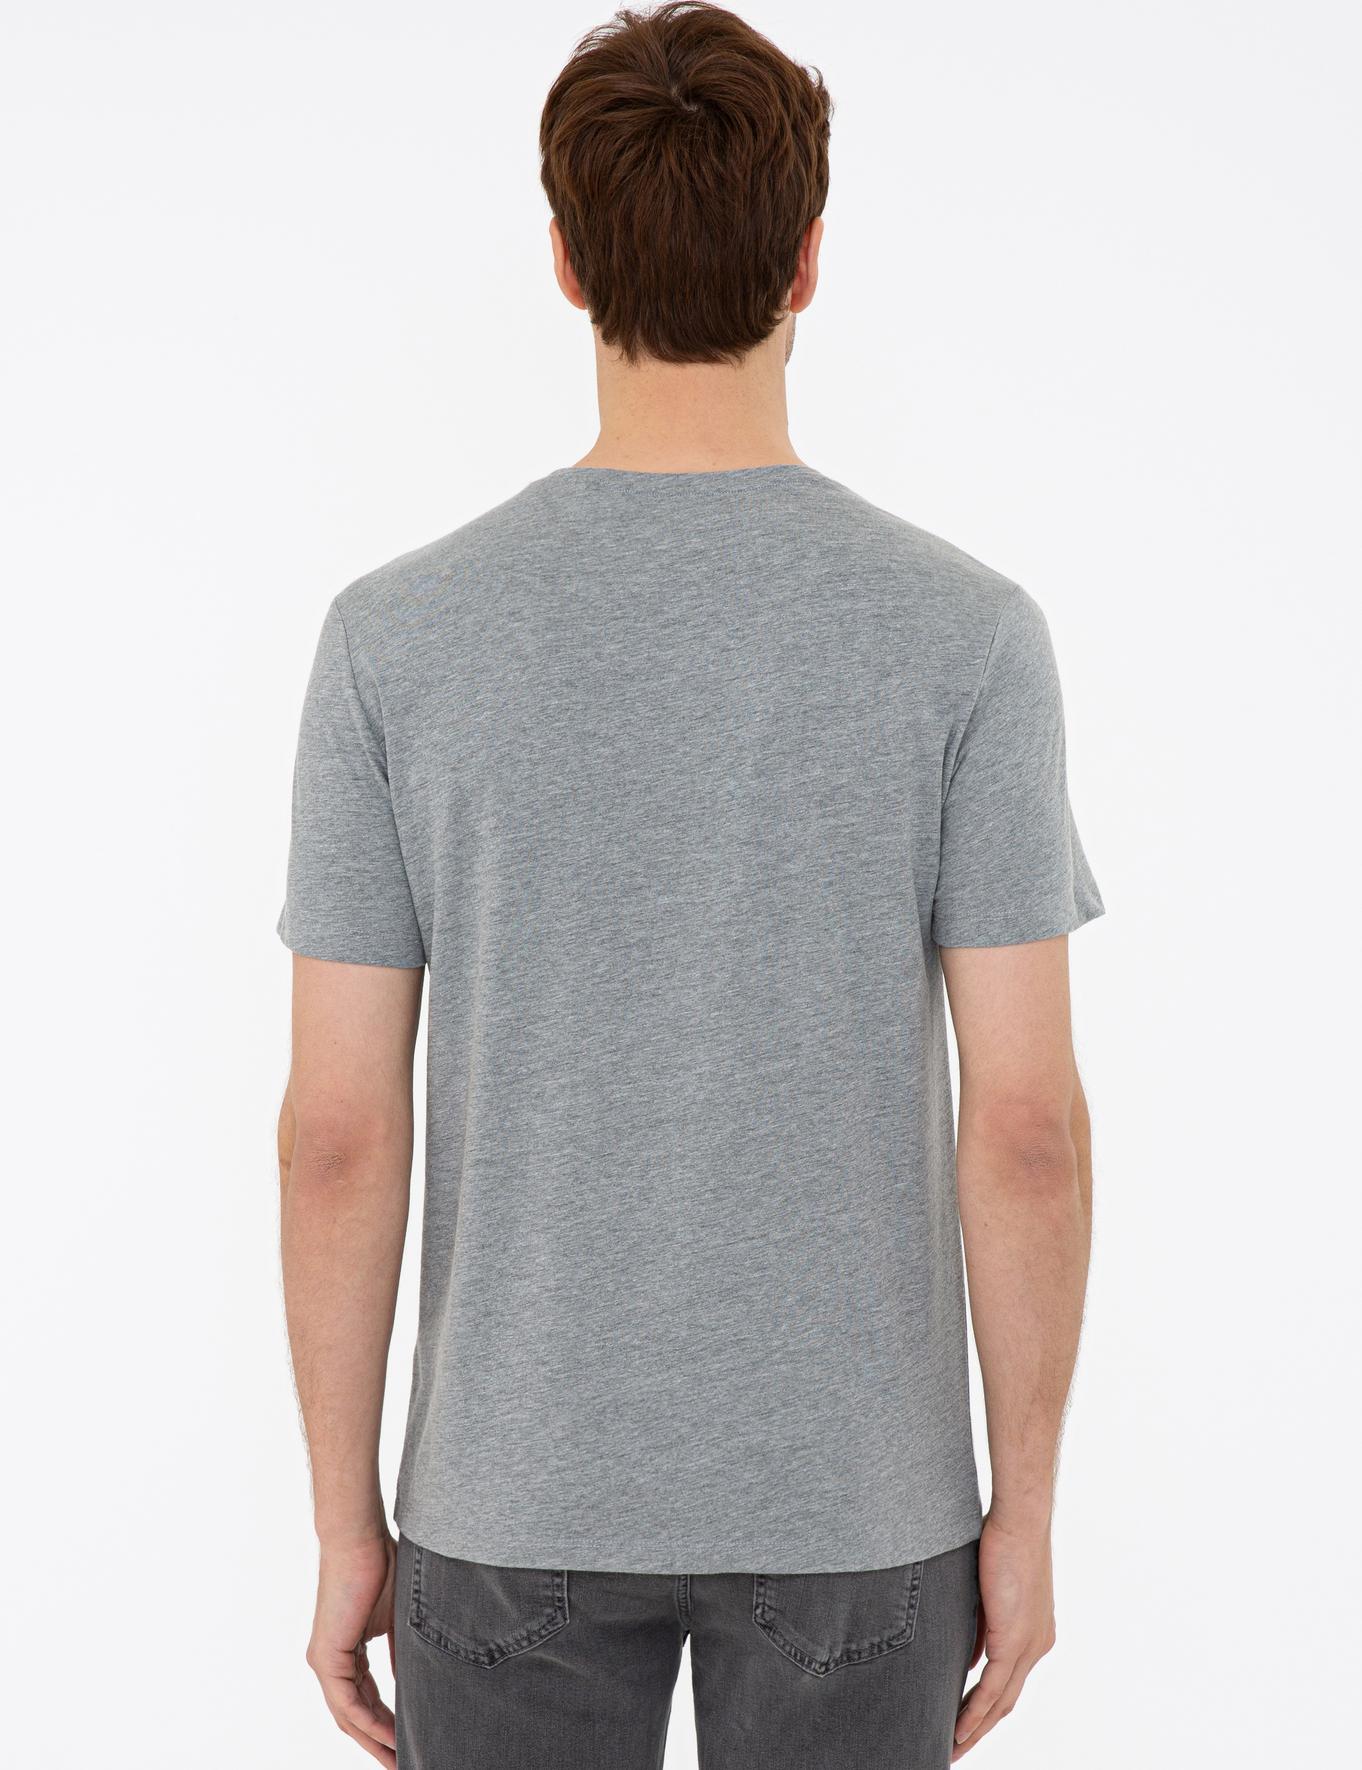 Bisiklet Yaka Basic T-Shirt - 50239832048